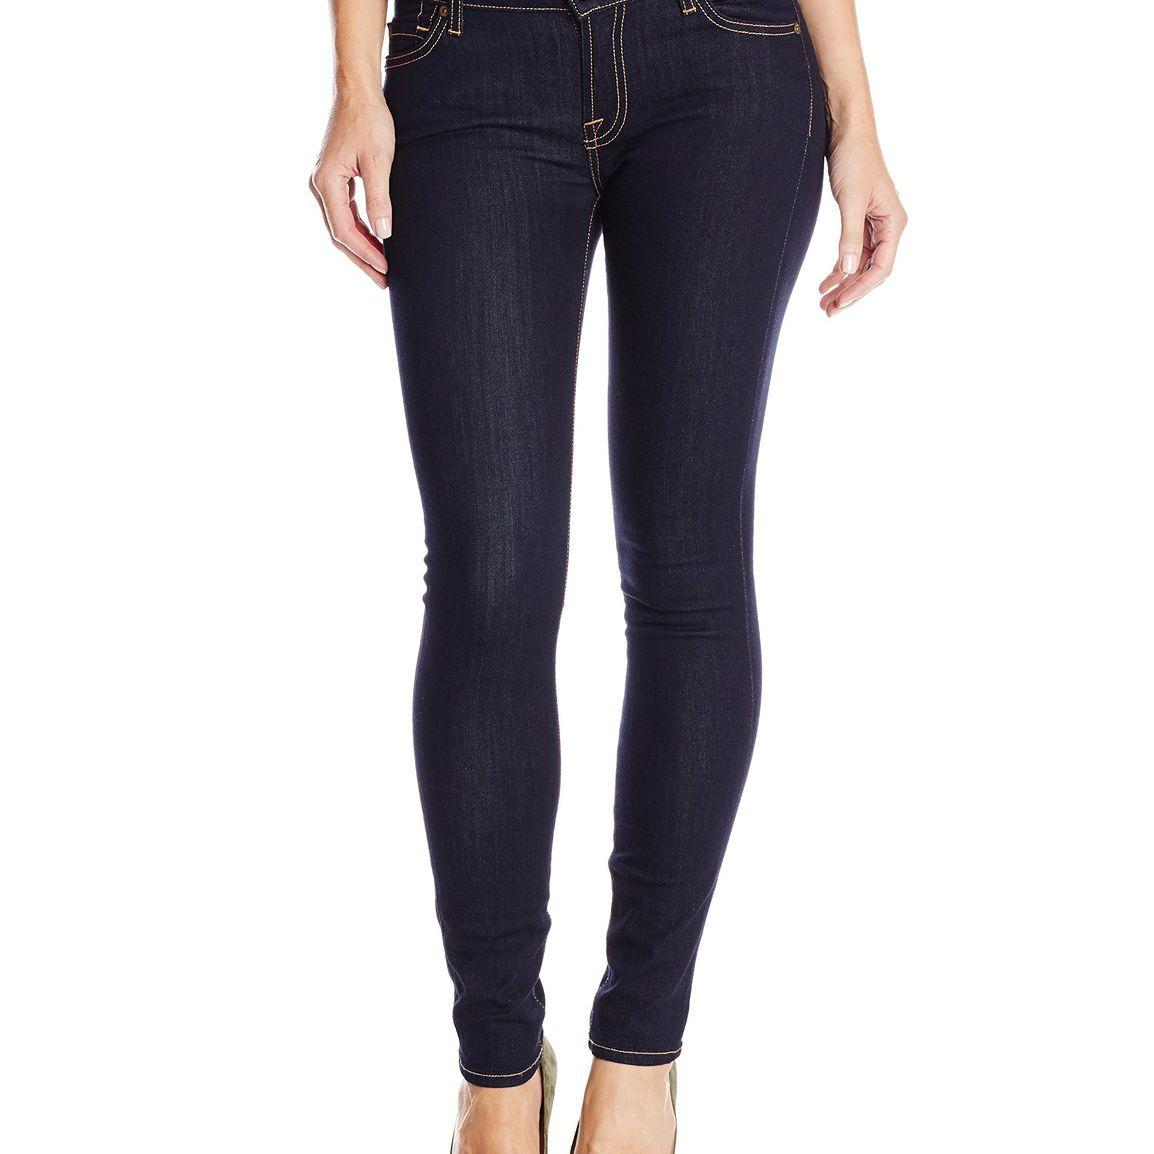 7 For All Mankind Women's Skinny Jean in Rinsed Indigo